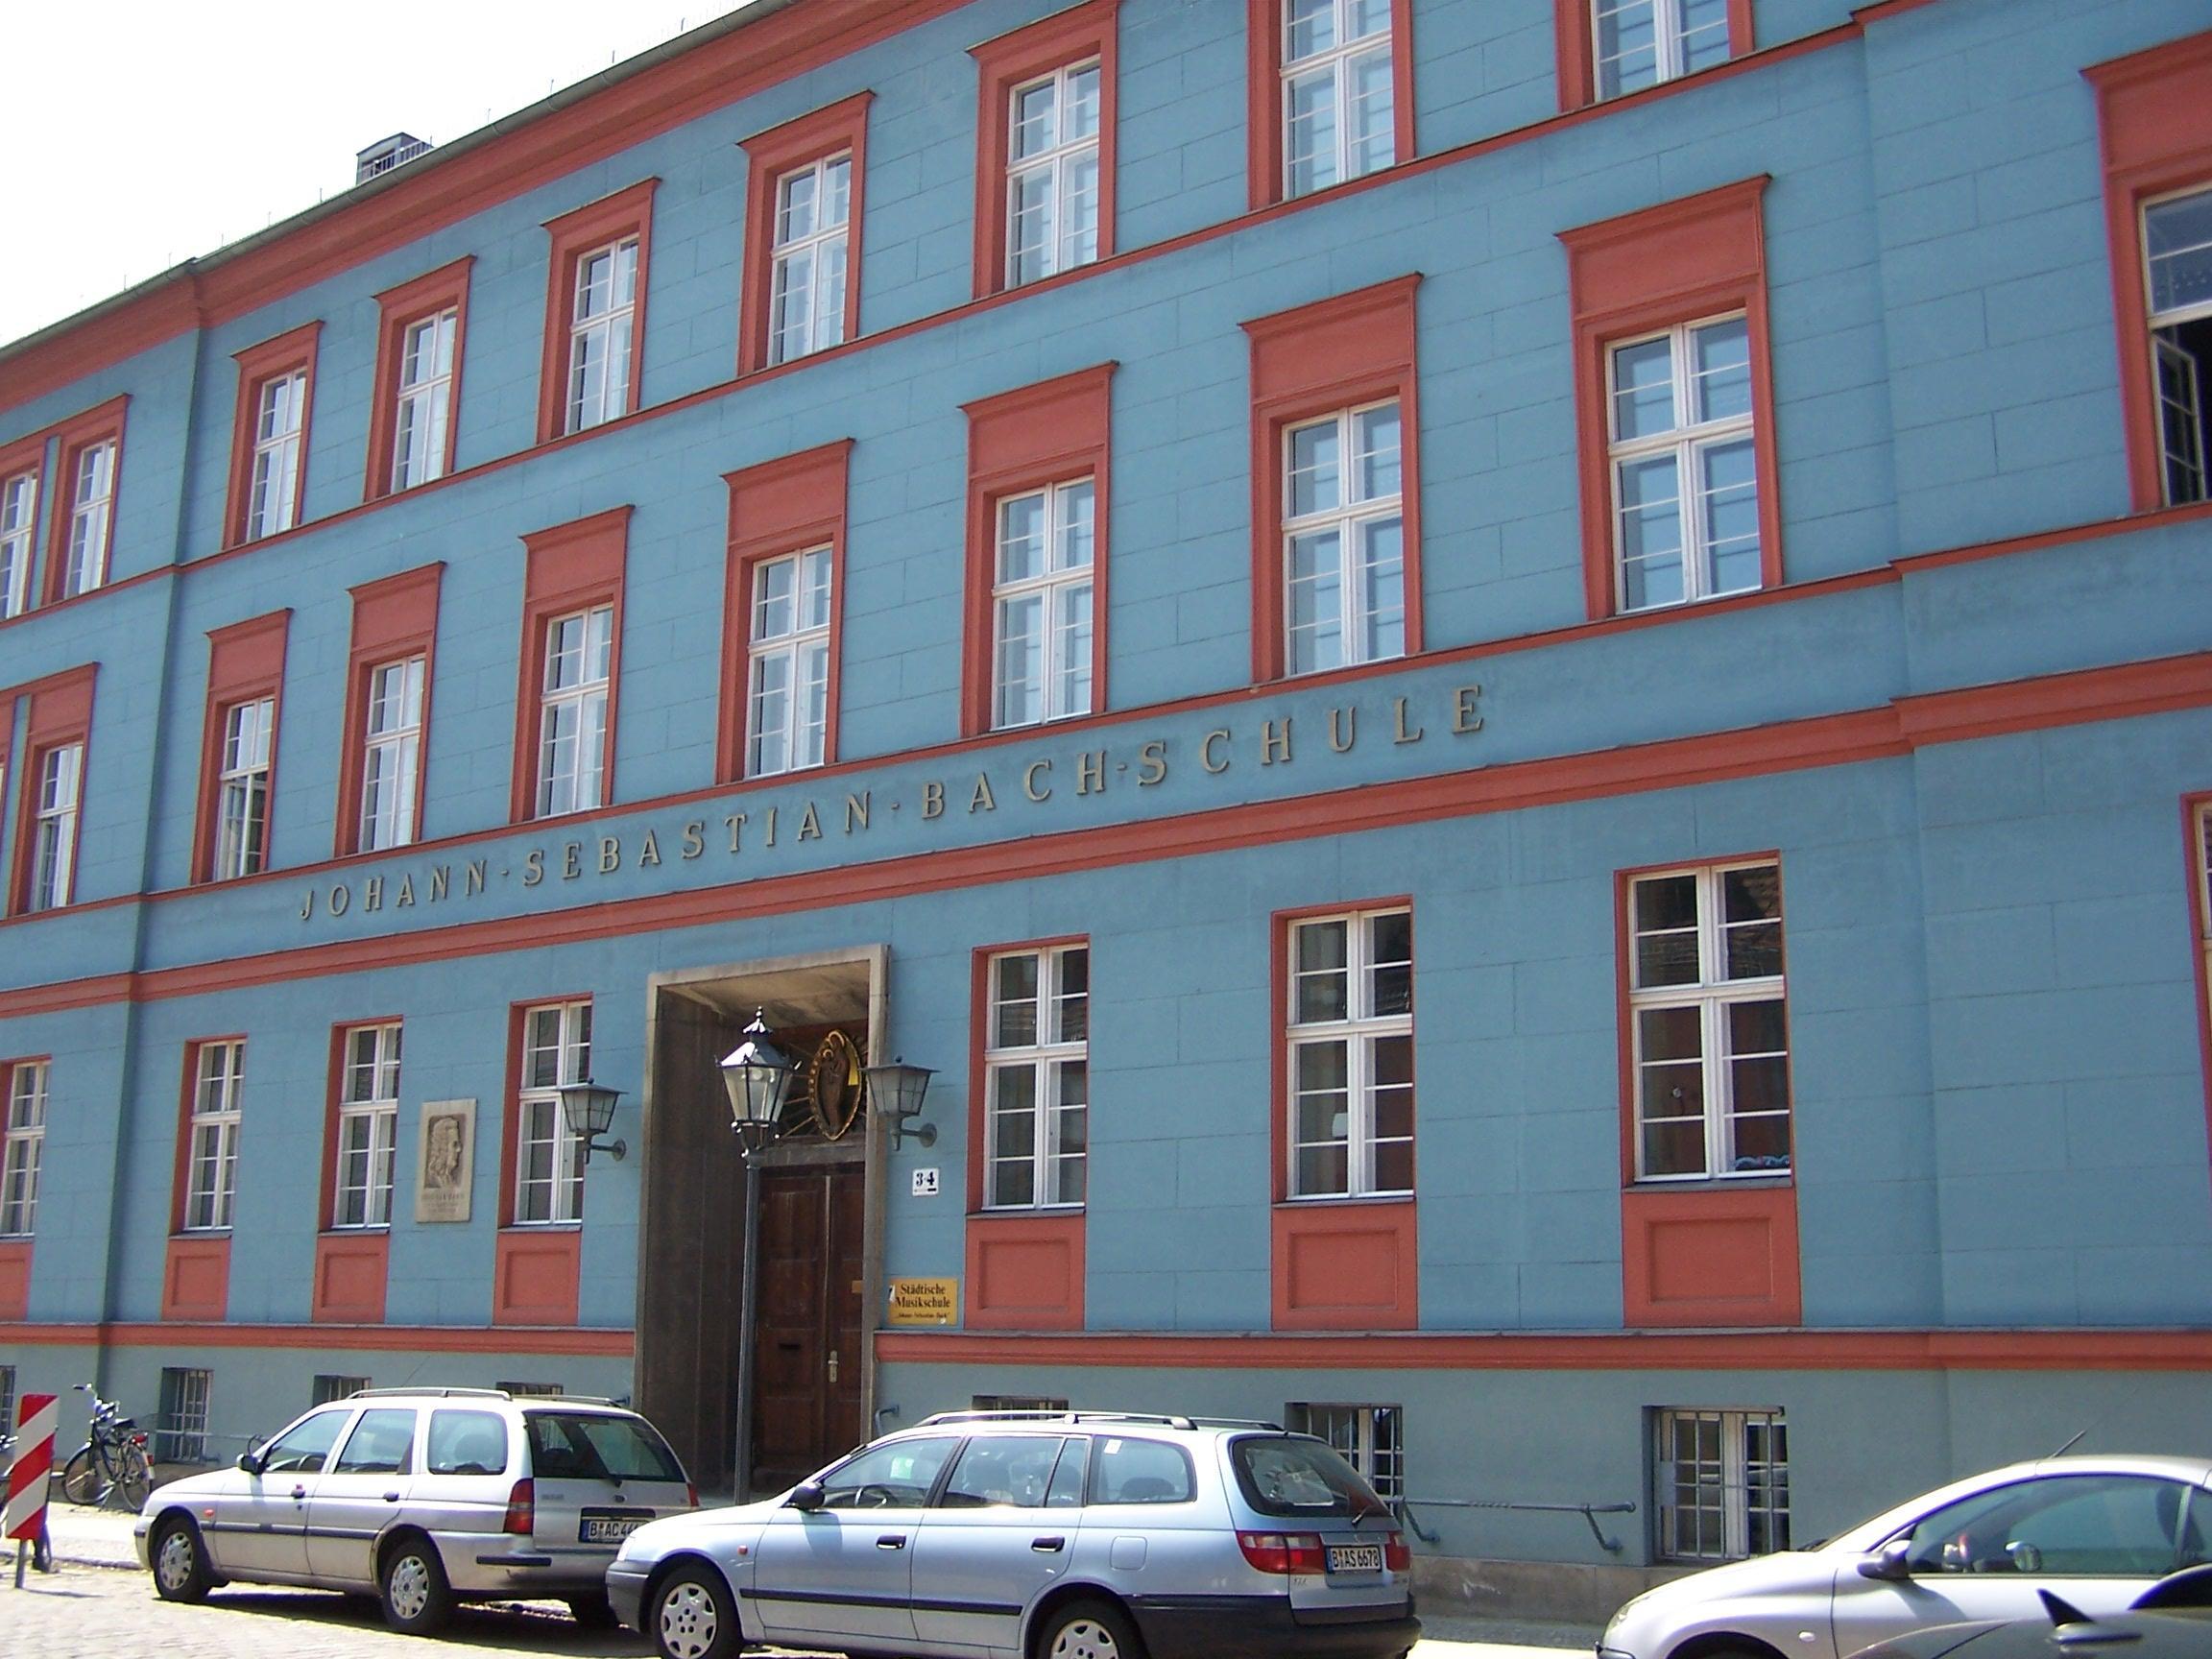 Gebäude der Musikschule Johann Sebastian Bach in Potsdam